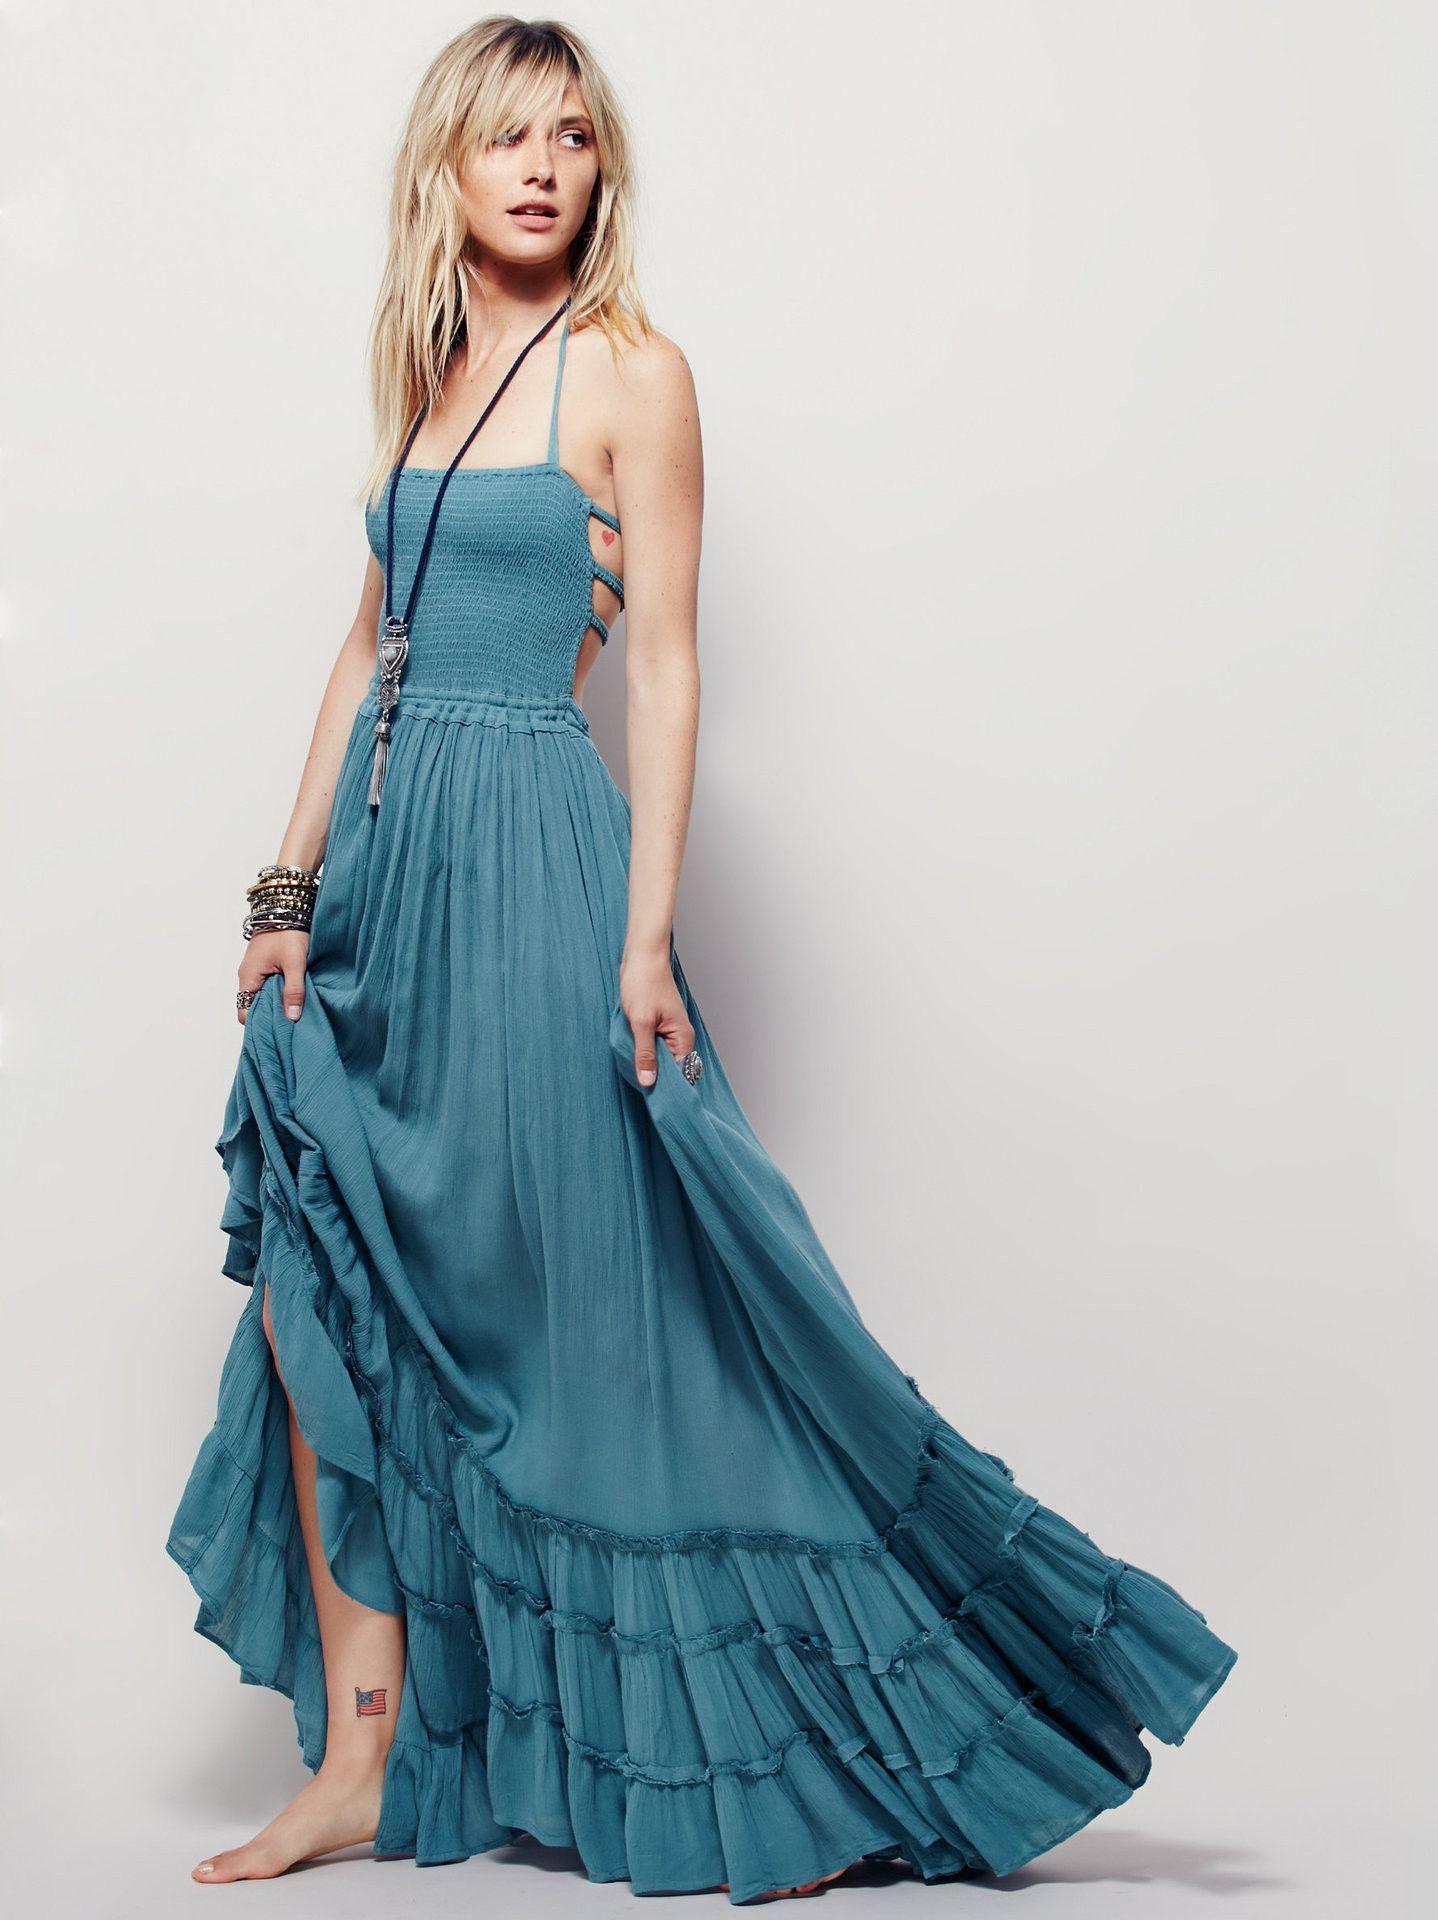 6b478b9a96c Backless Spaghetti Strap Sleeveless Long Beach Dress